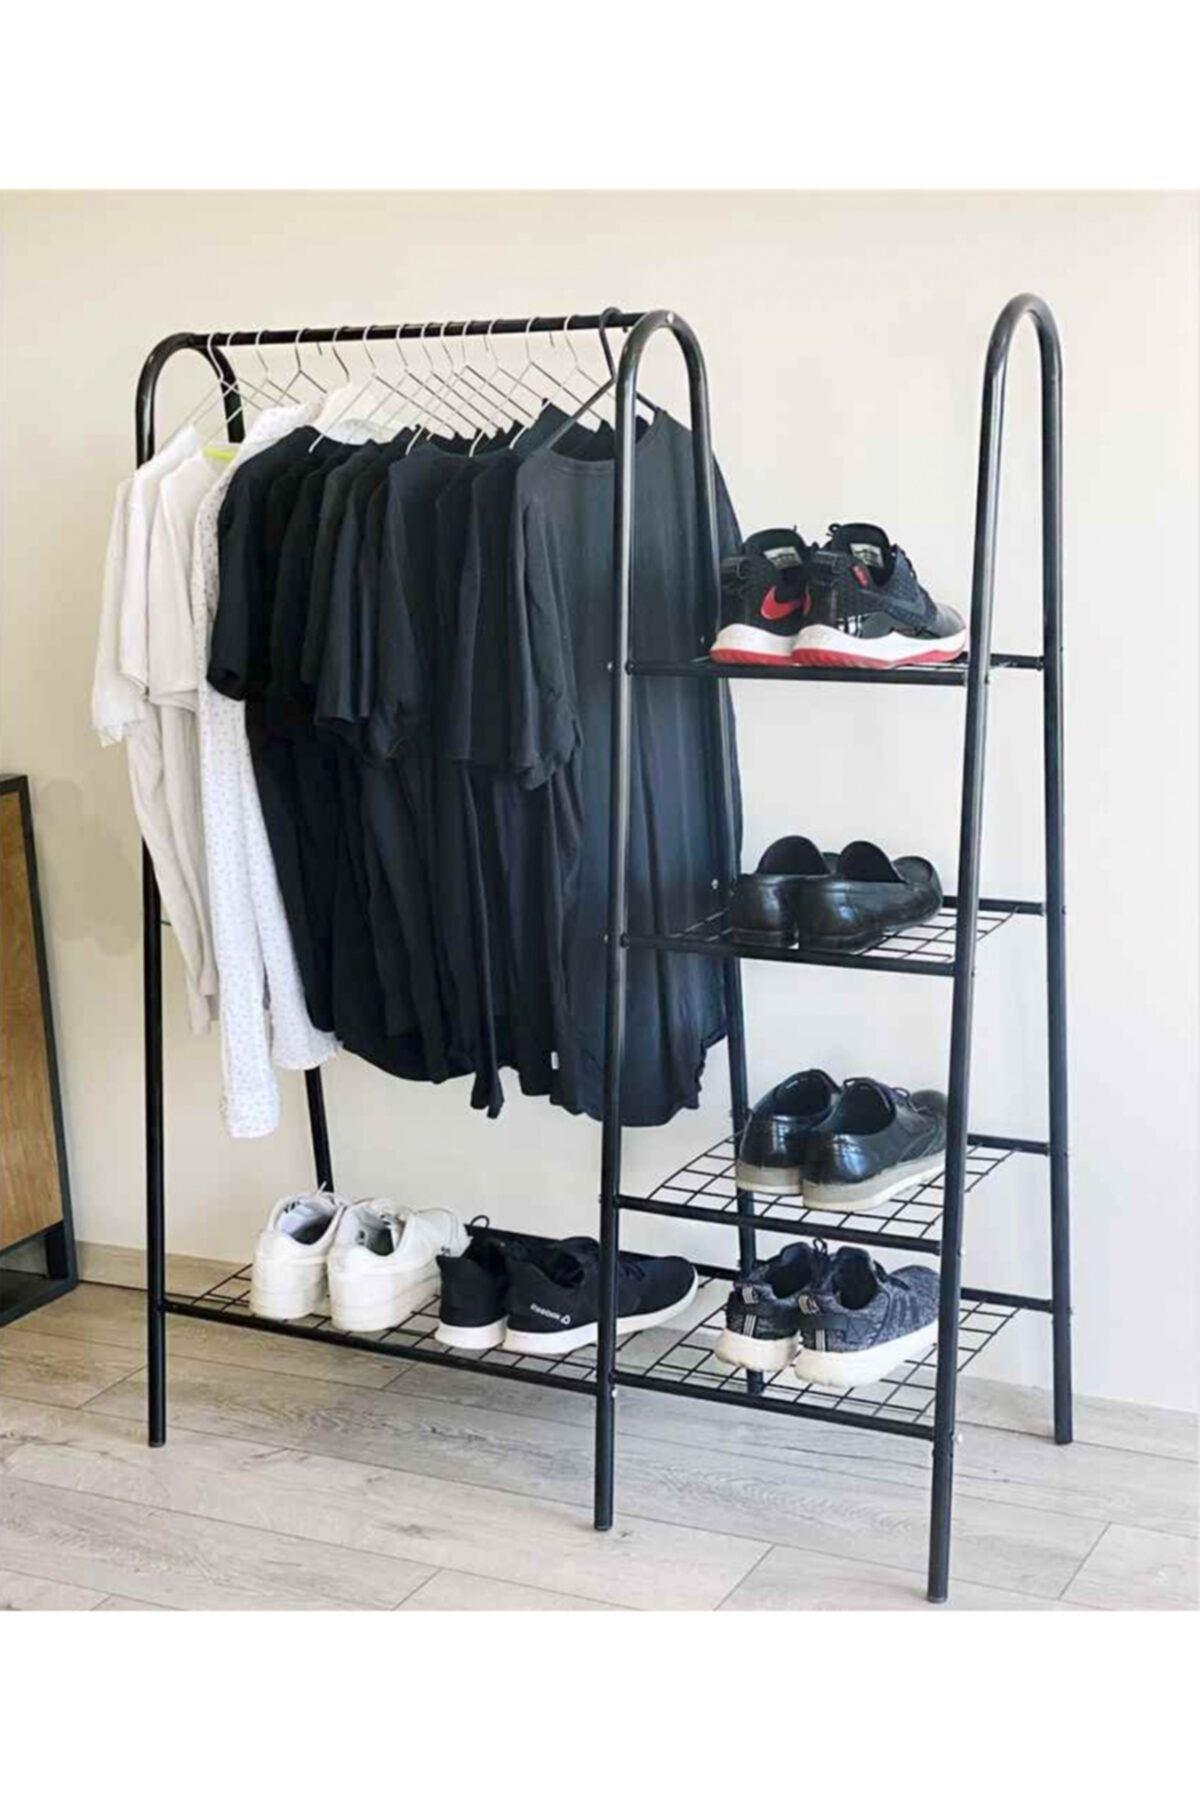 Stand suport umerase si pantofi, Garderob Homs, metal, negru